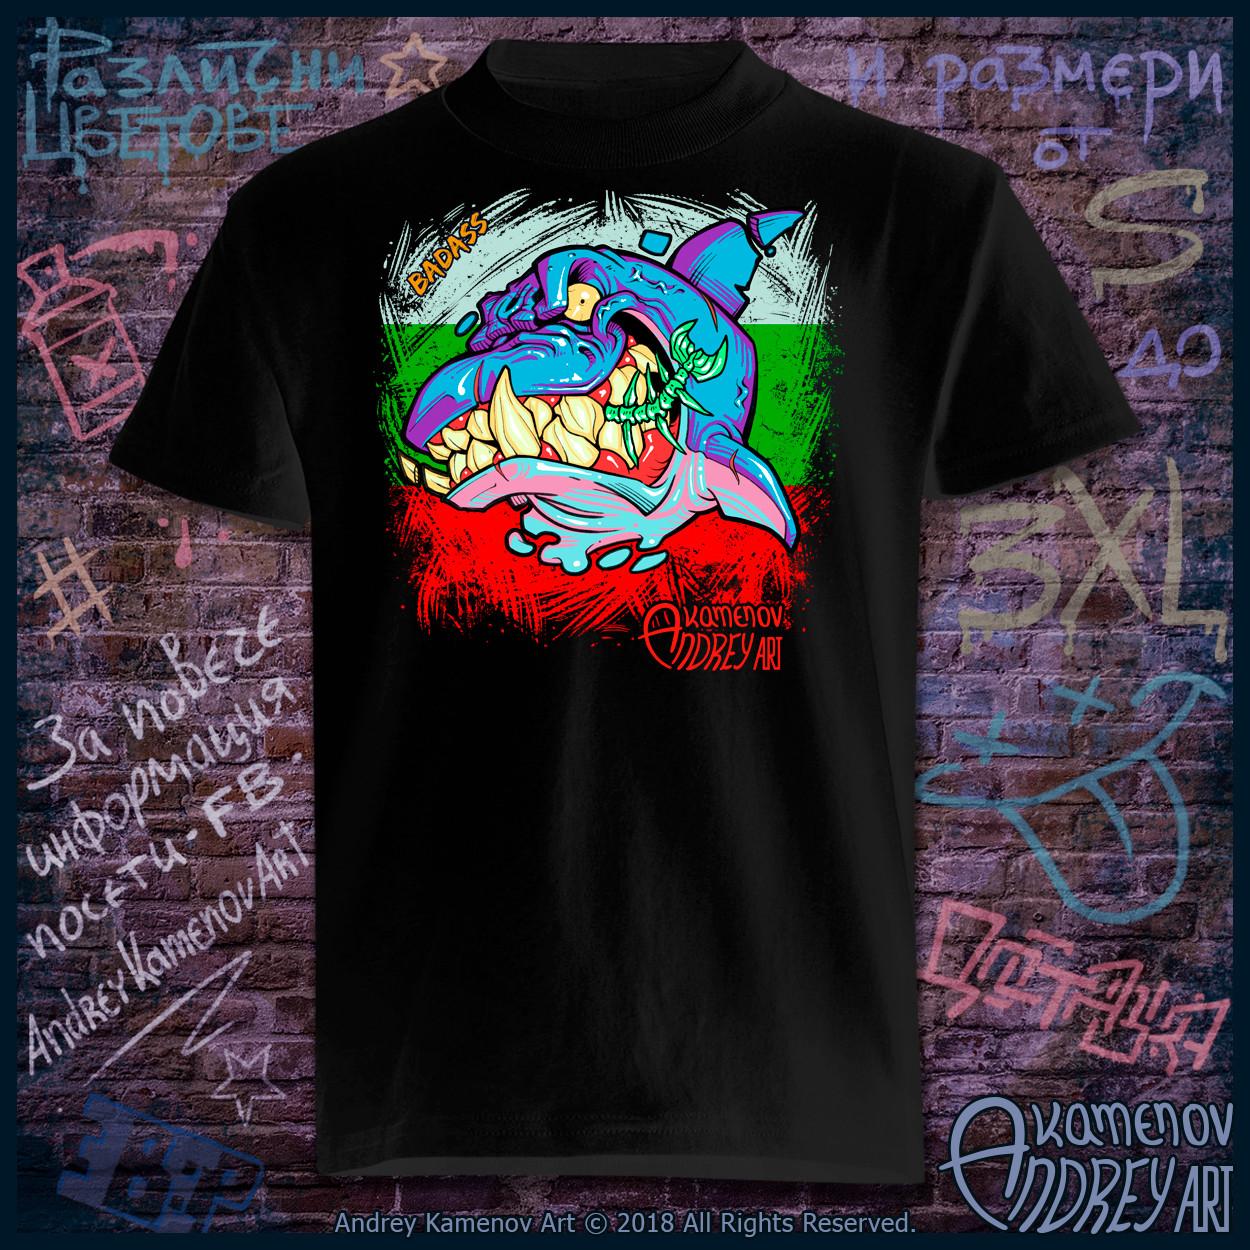 Andrey kamenov badass dolphin t shirt bg 01